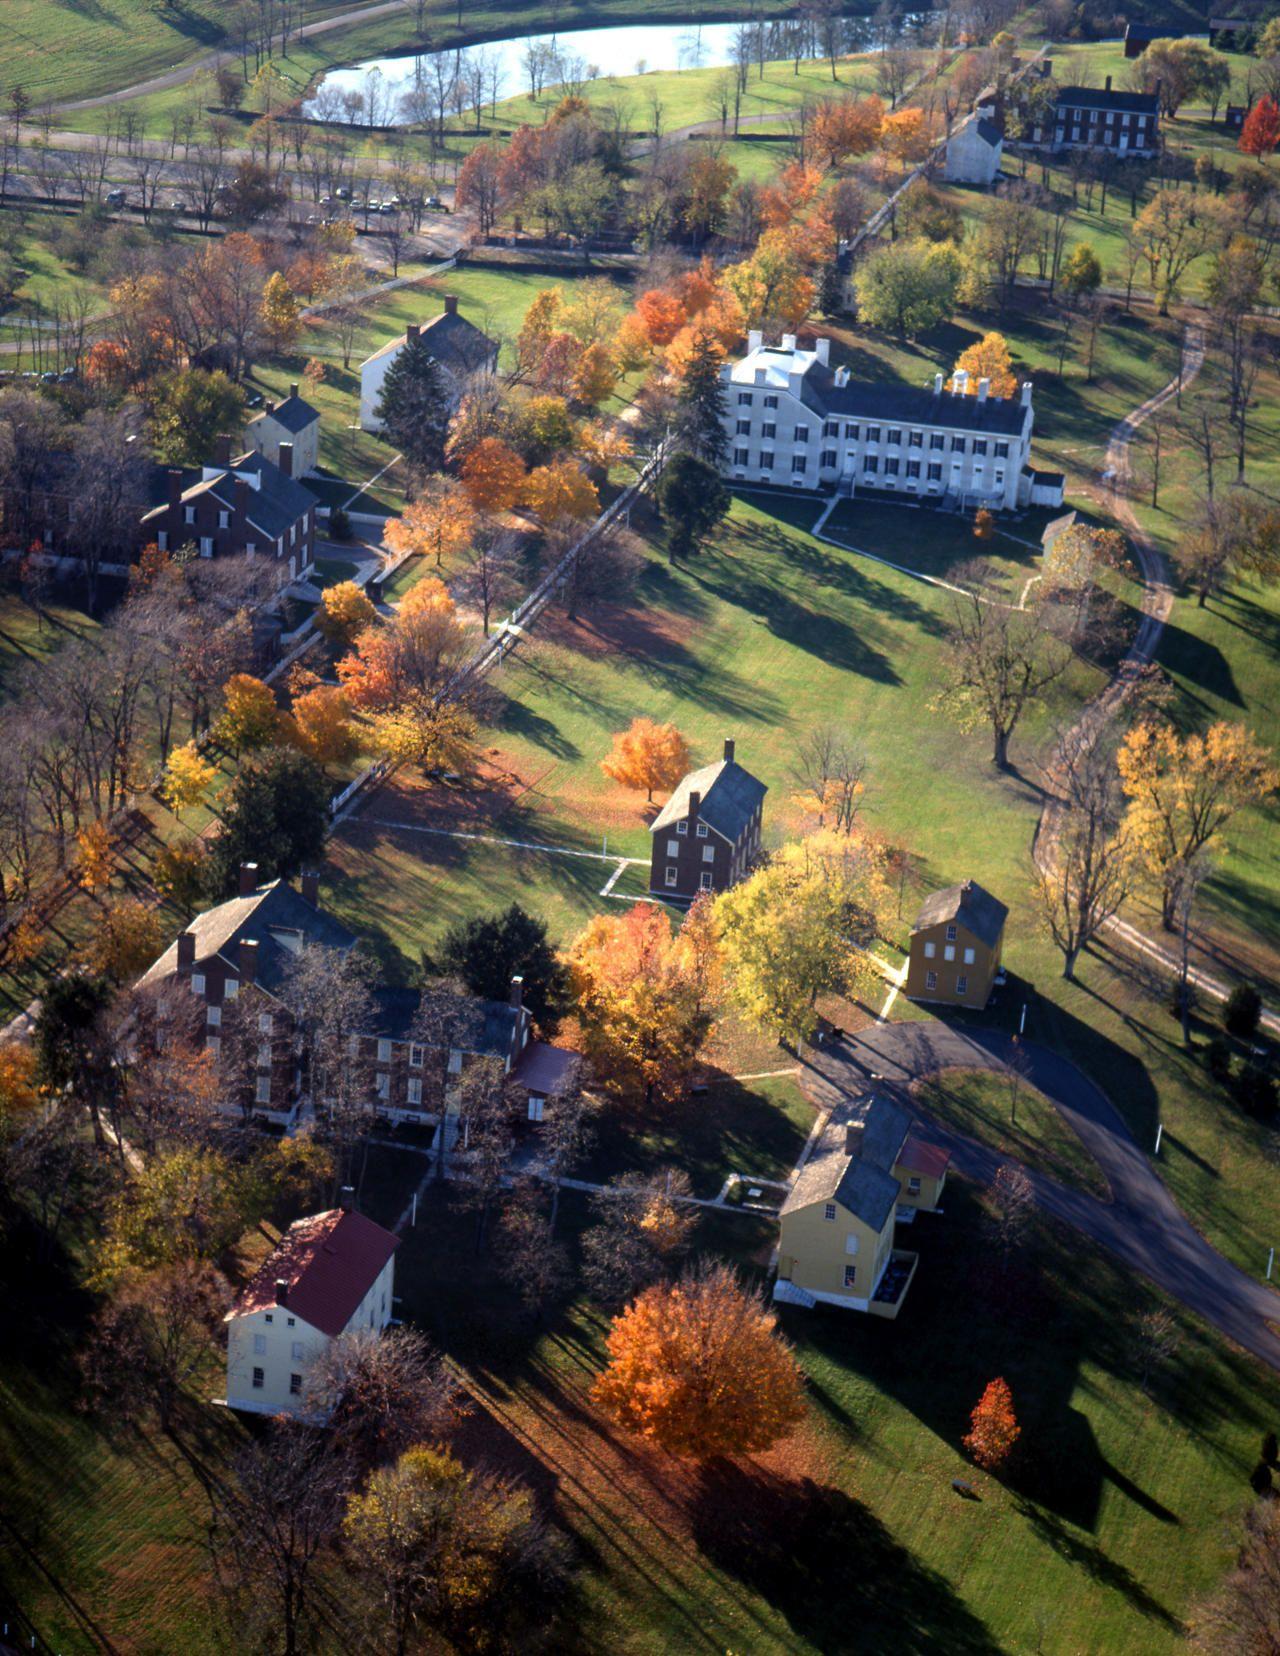 Shaker Village, Kentucky